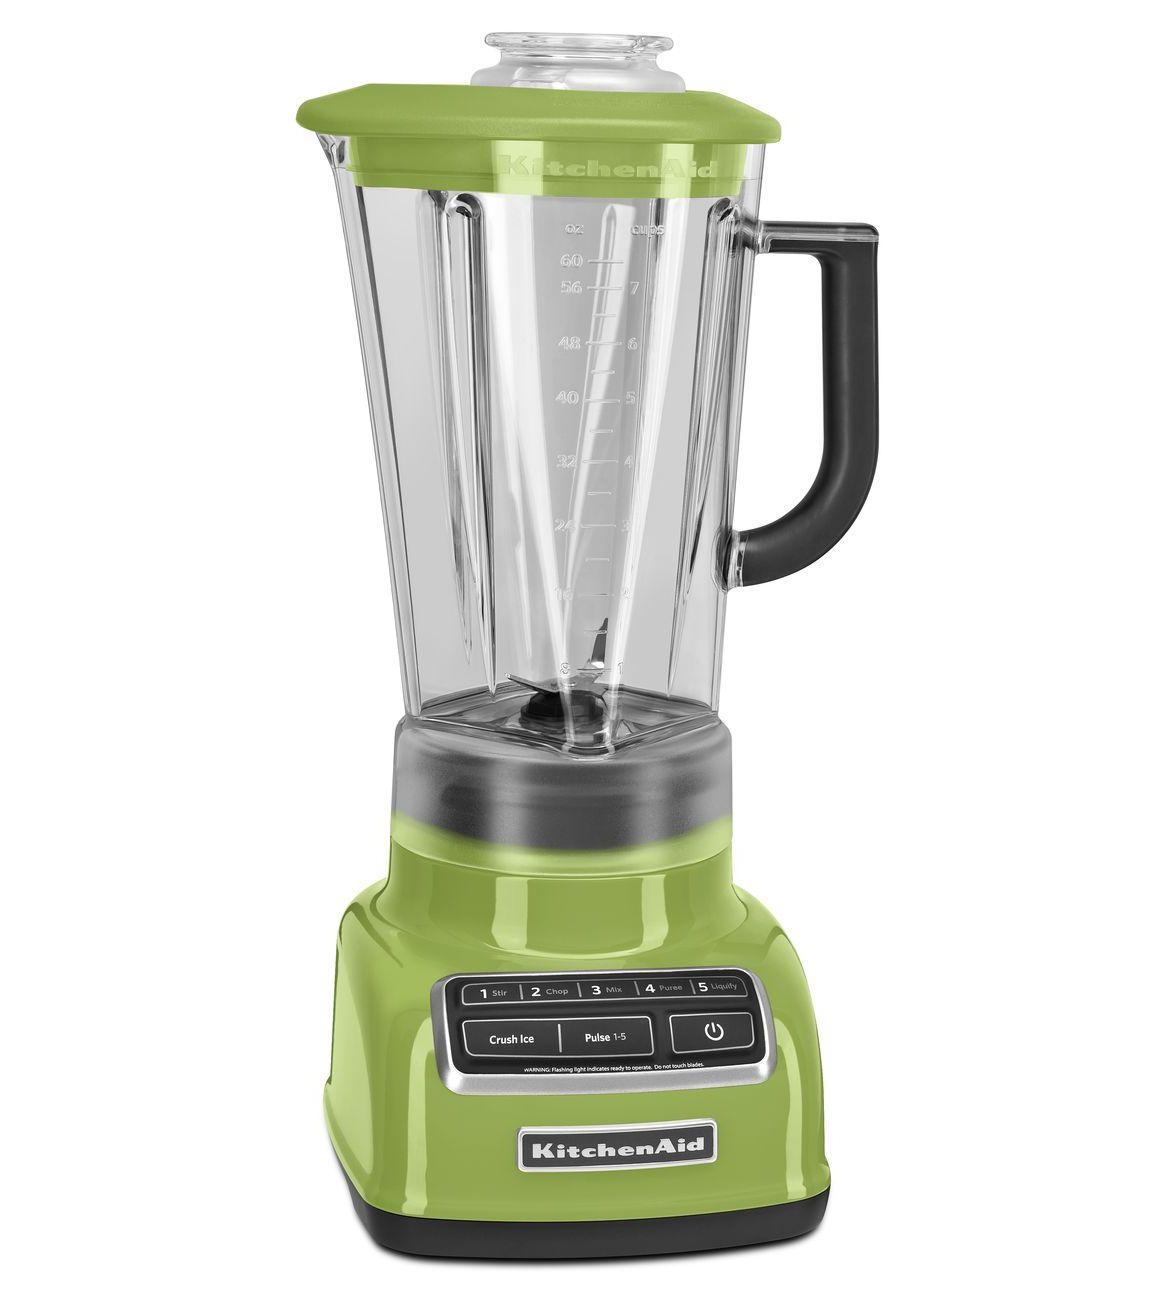 KitchenAid Green Apple 5-Speed Diamond Blender